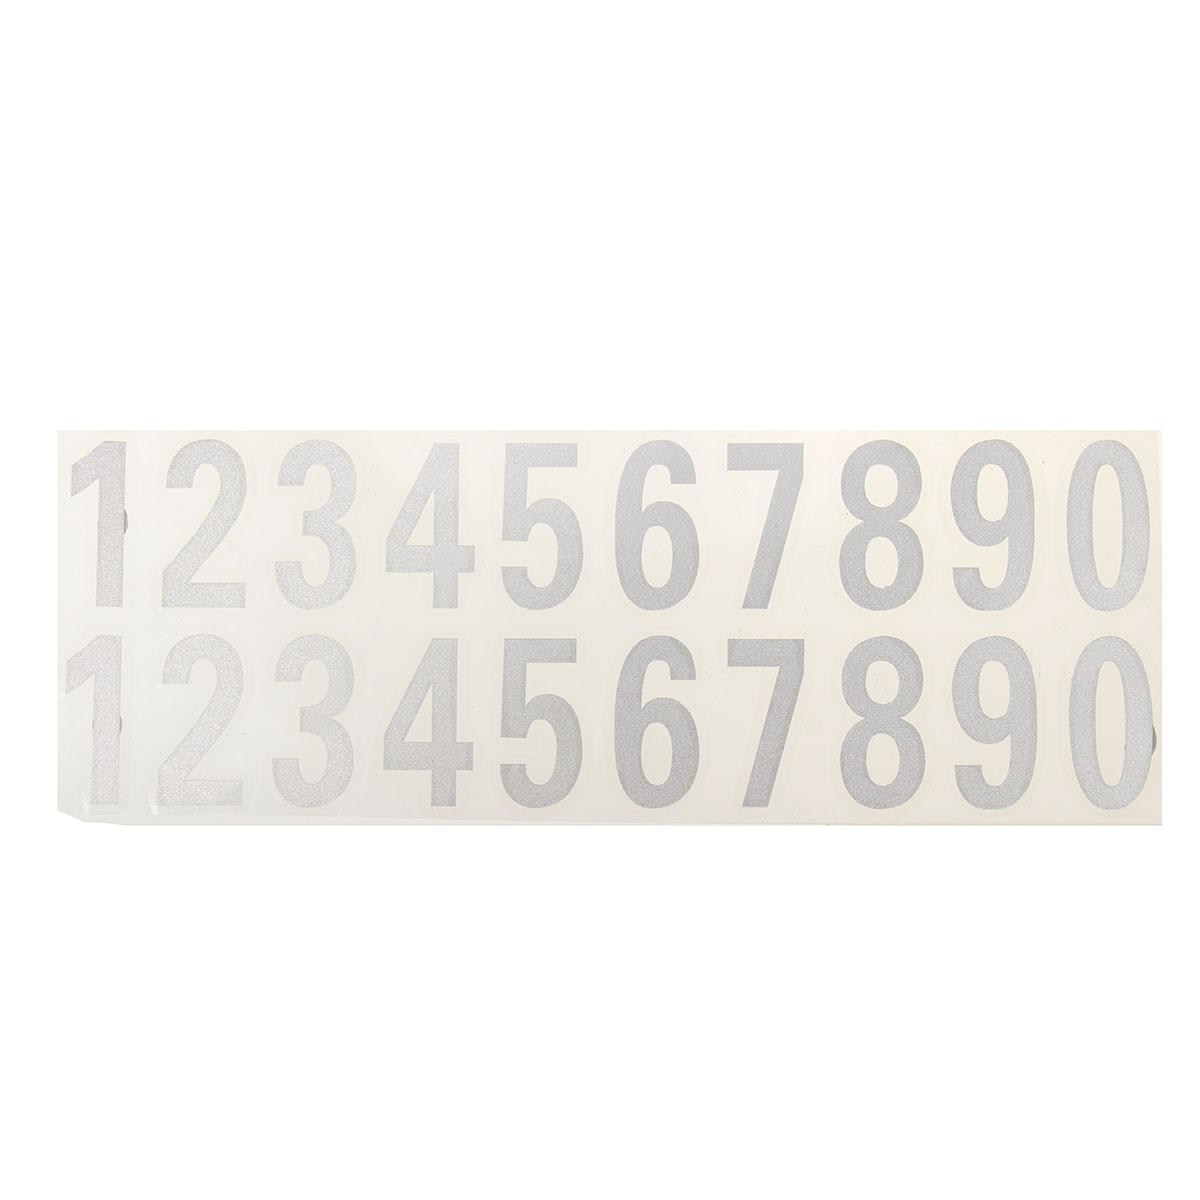 Number Reflective Sticker Car Vinyl Decal Street Address Mailbox Number Stickers White Black